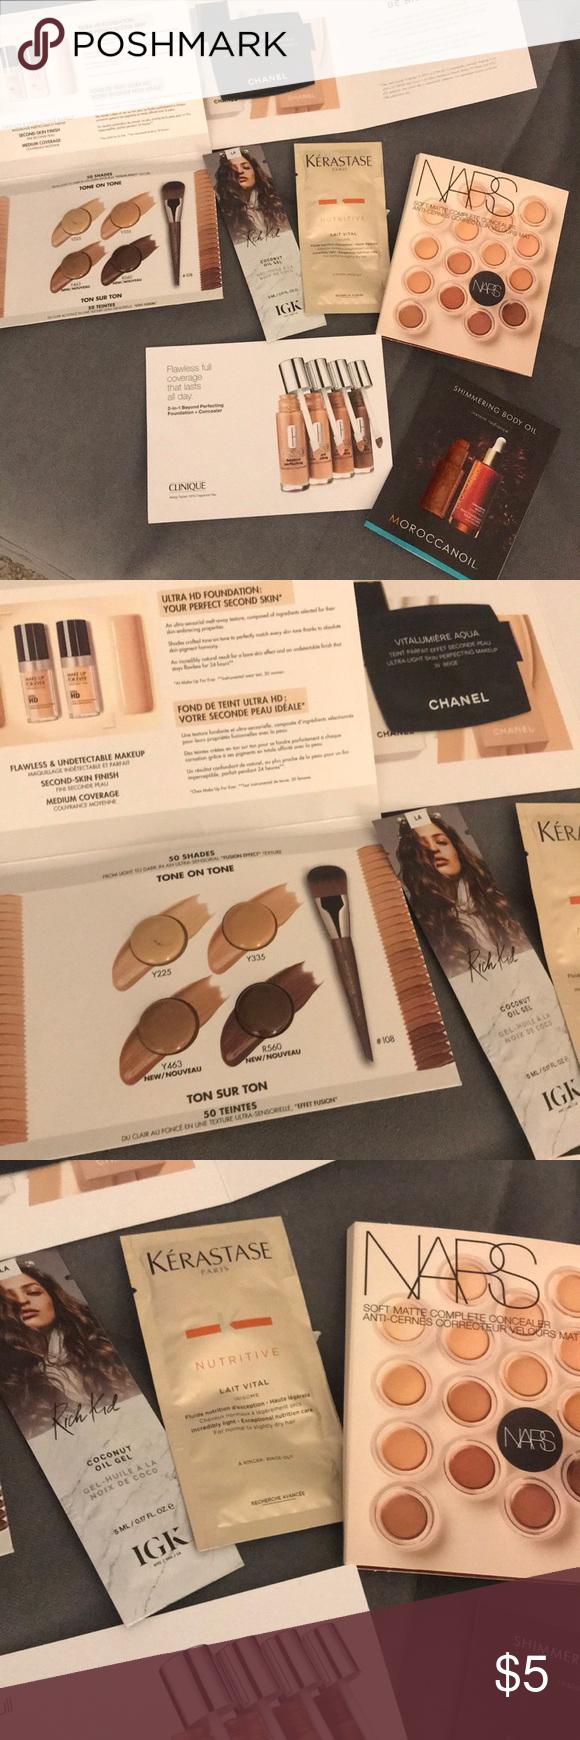 Sephora Samples in 2020 Sephora, Sephora makeup, Womens